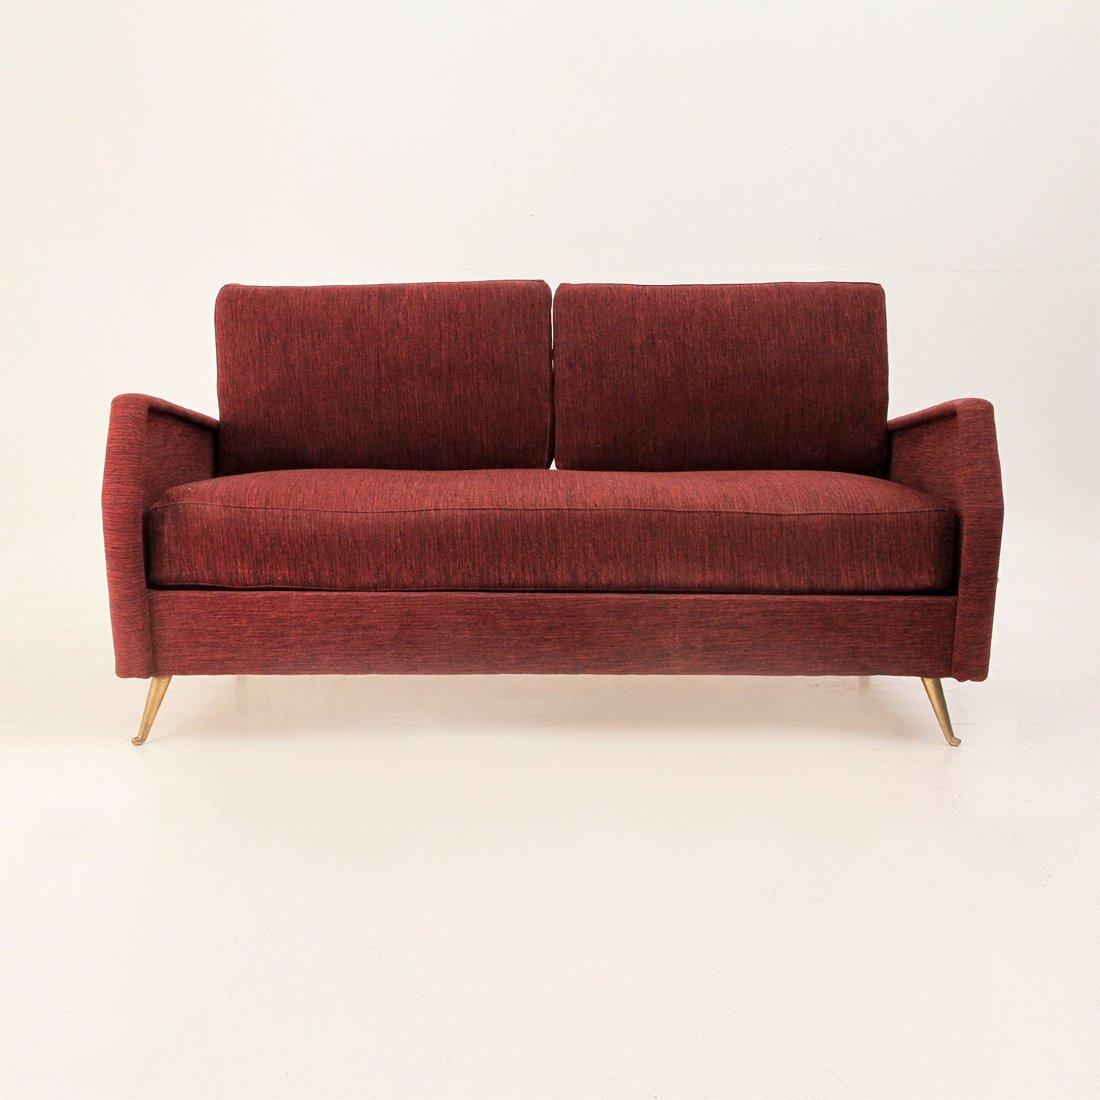 Mid-Century Italian Sofa Bed, 1950s For Sale At Pamono